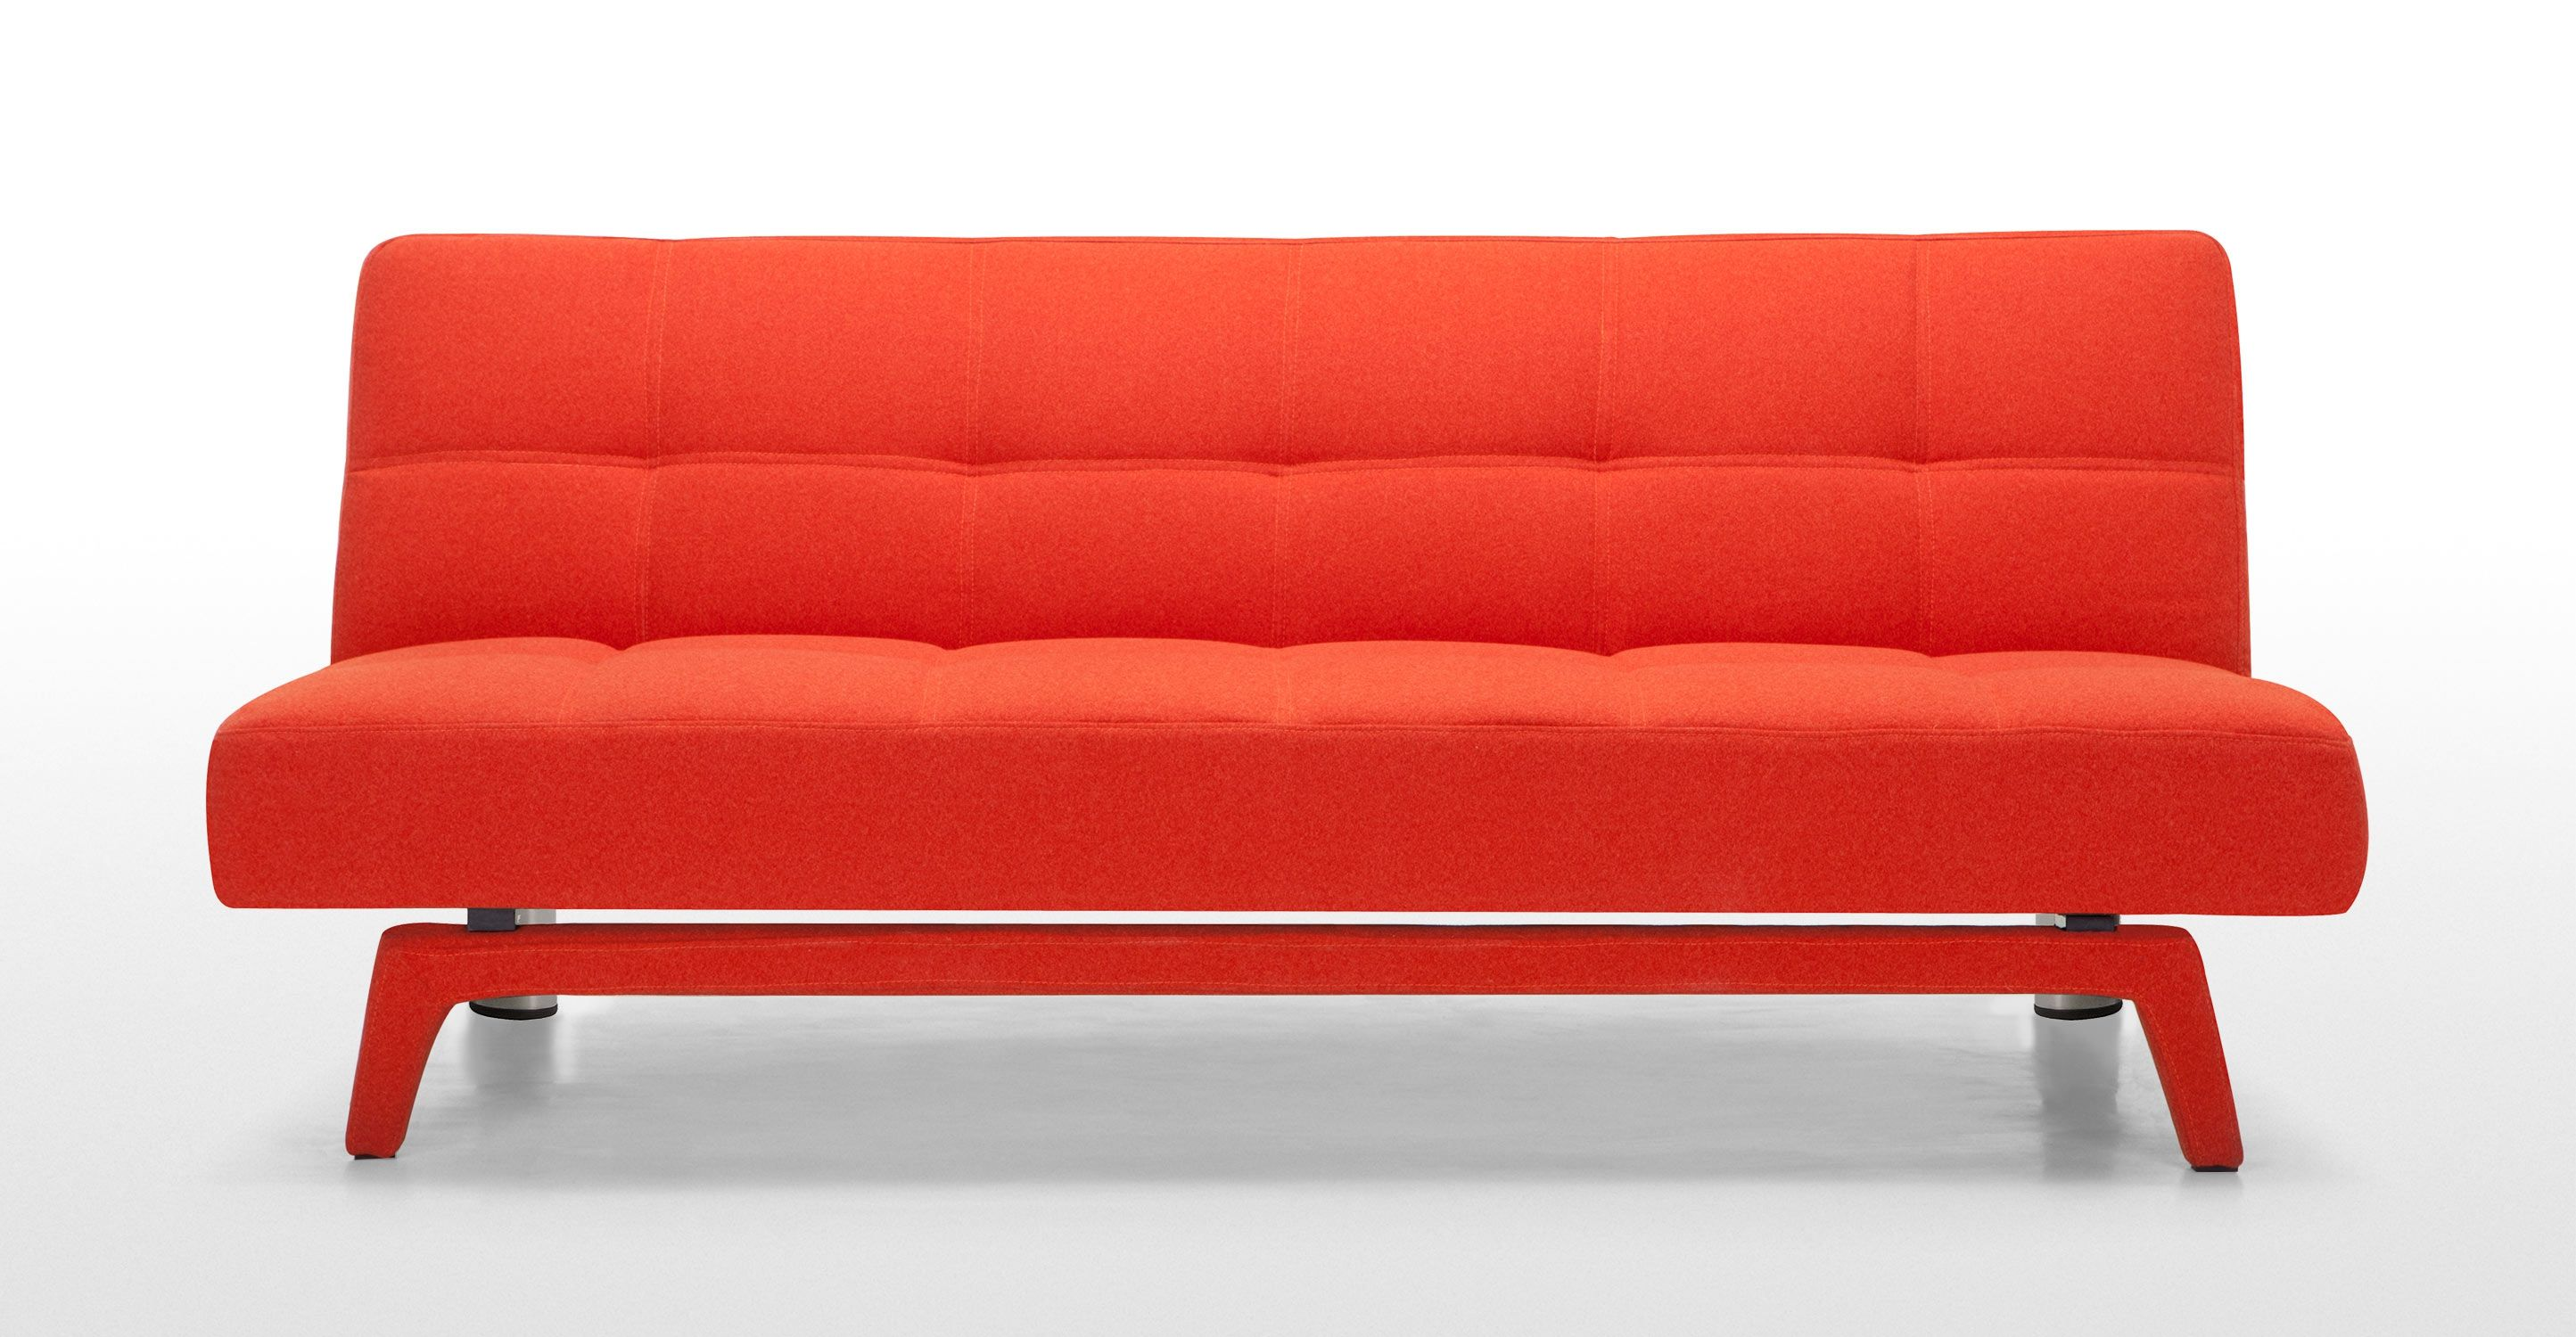 Yoko Sofa Bed Saffron Orange Sofa Bed Compact Sofa Bed Sofa Bed For Small Spaces